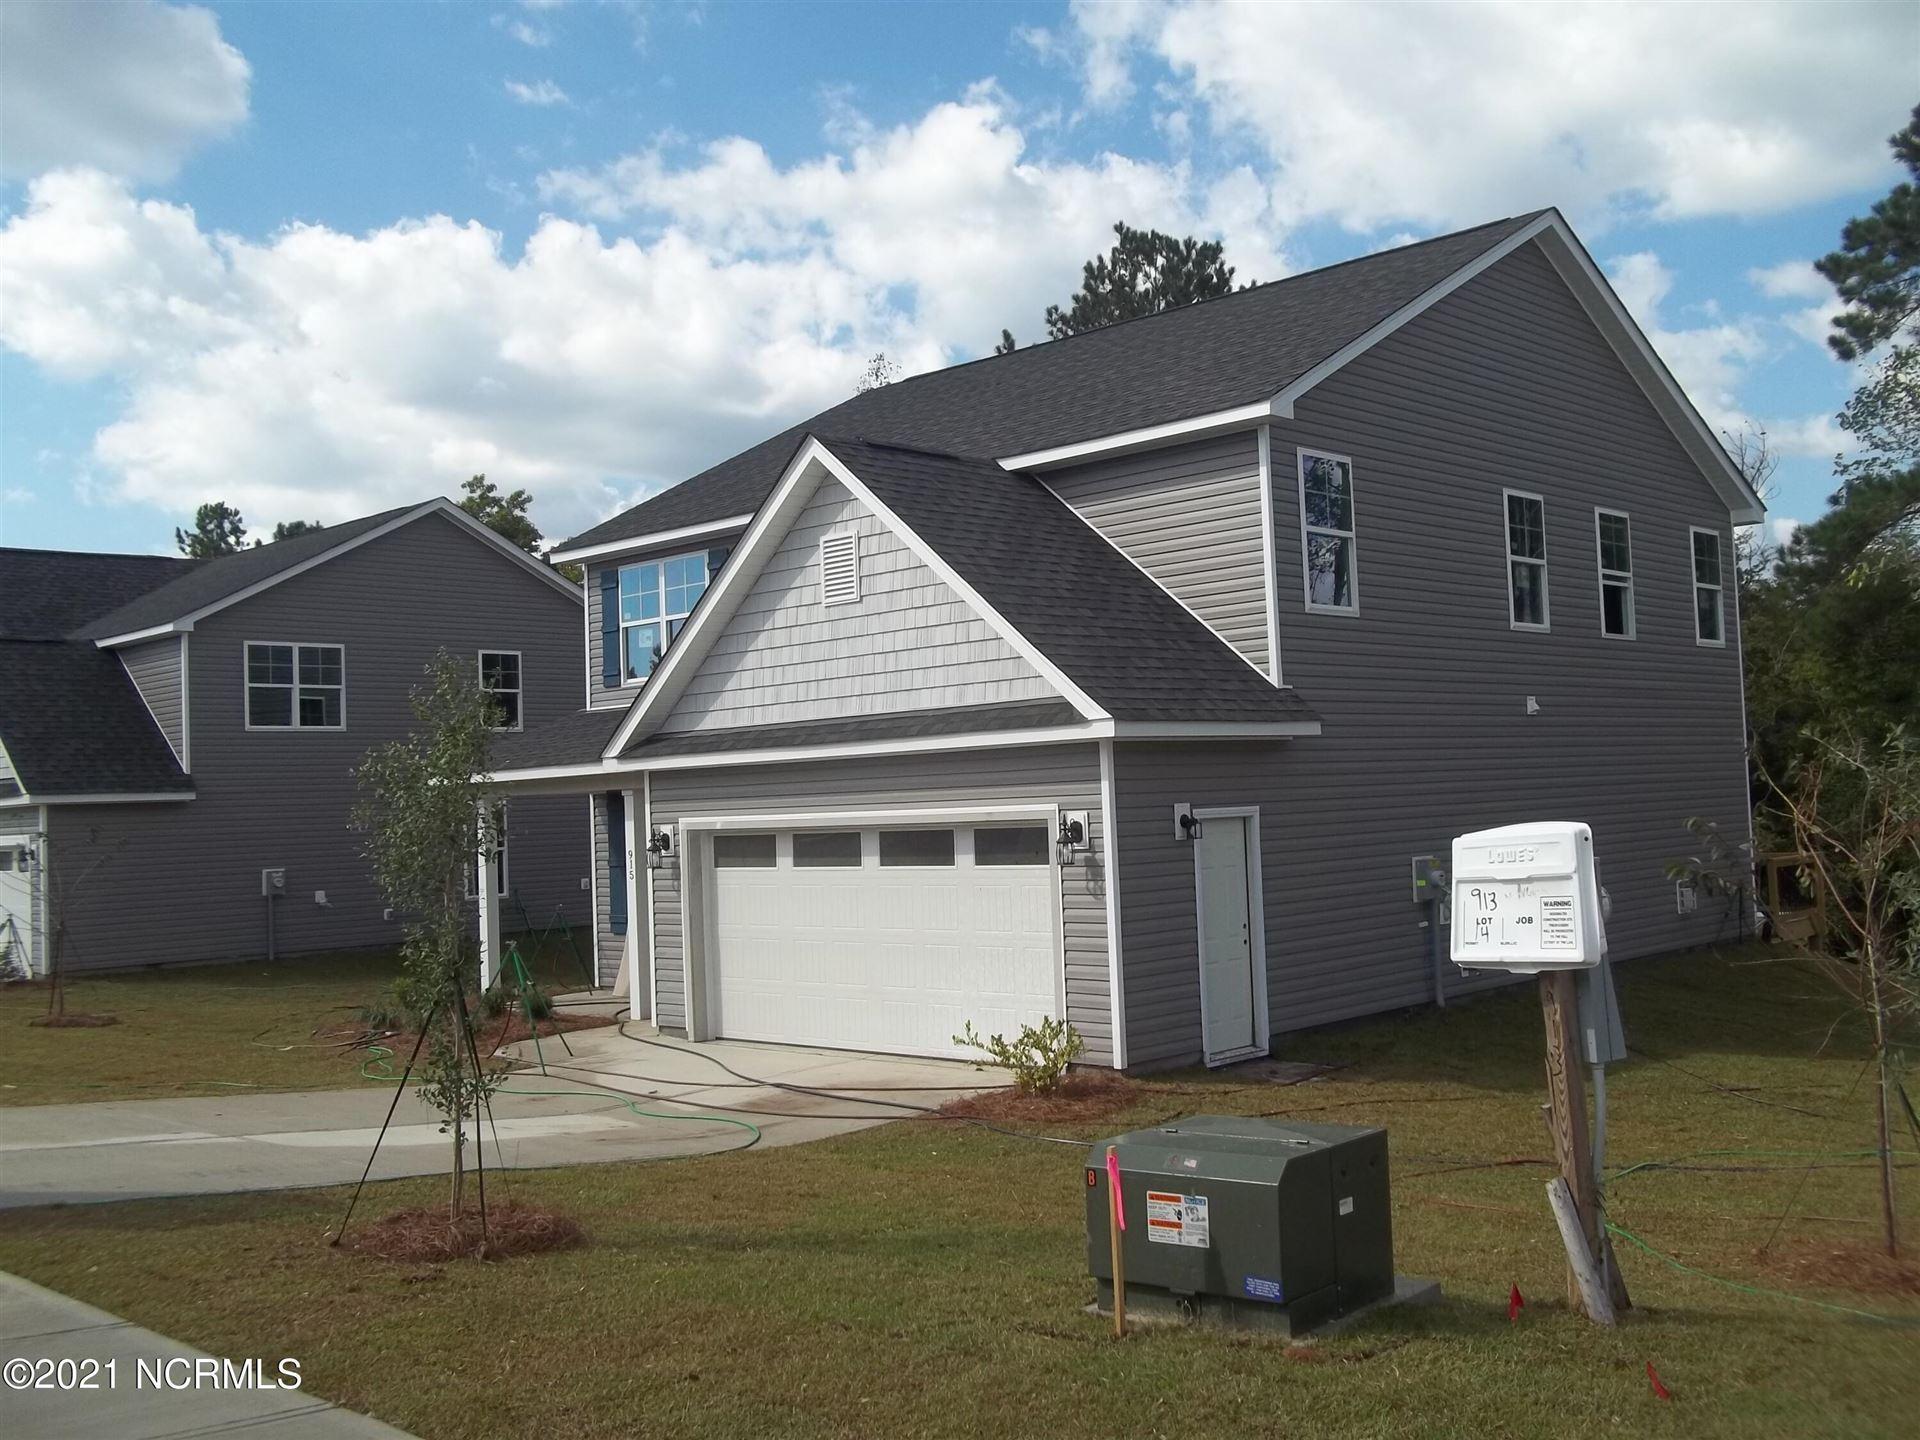 Photo of 915 W Arboria Drive, Hampstead, NC 28443 (MLS # 100284674)